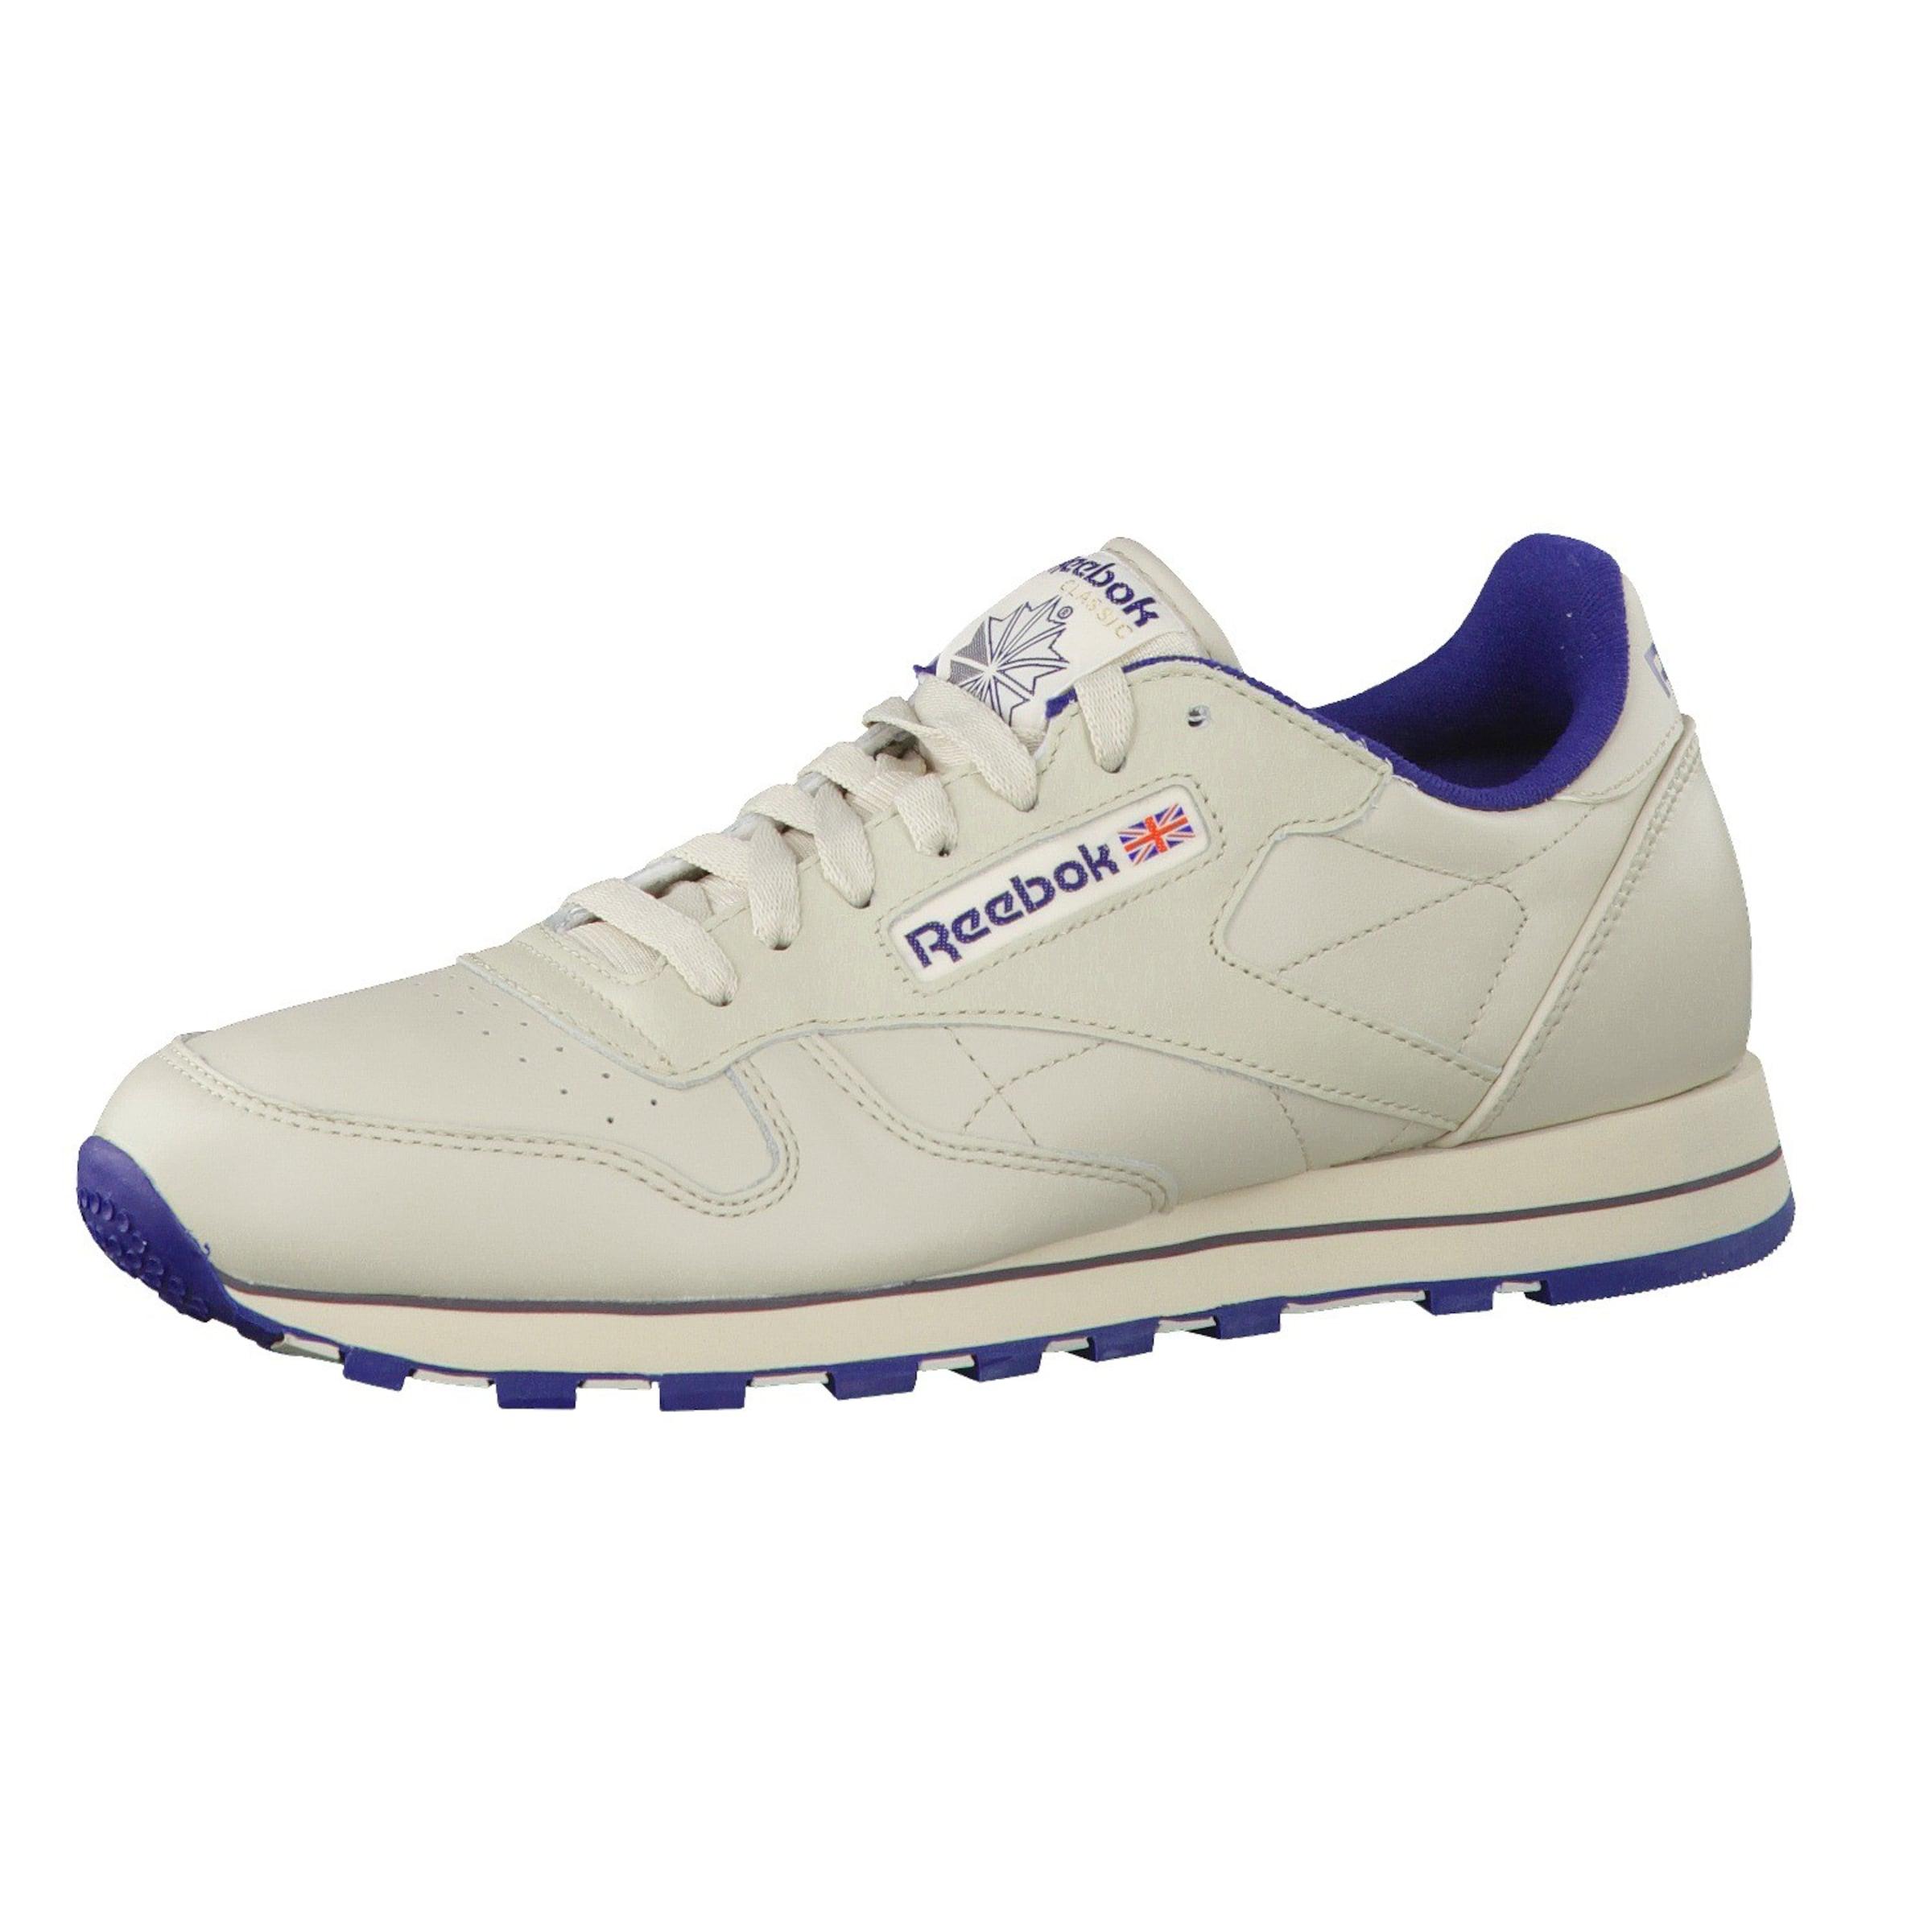 Haltbare Mode | billige Schuhe Reebok classic | Mode Sneaker 'Classic' Schuhe Gut getragene Schuhe 199440